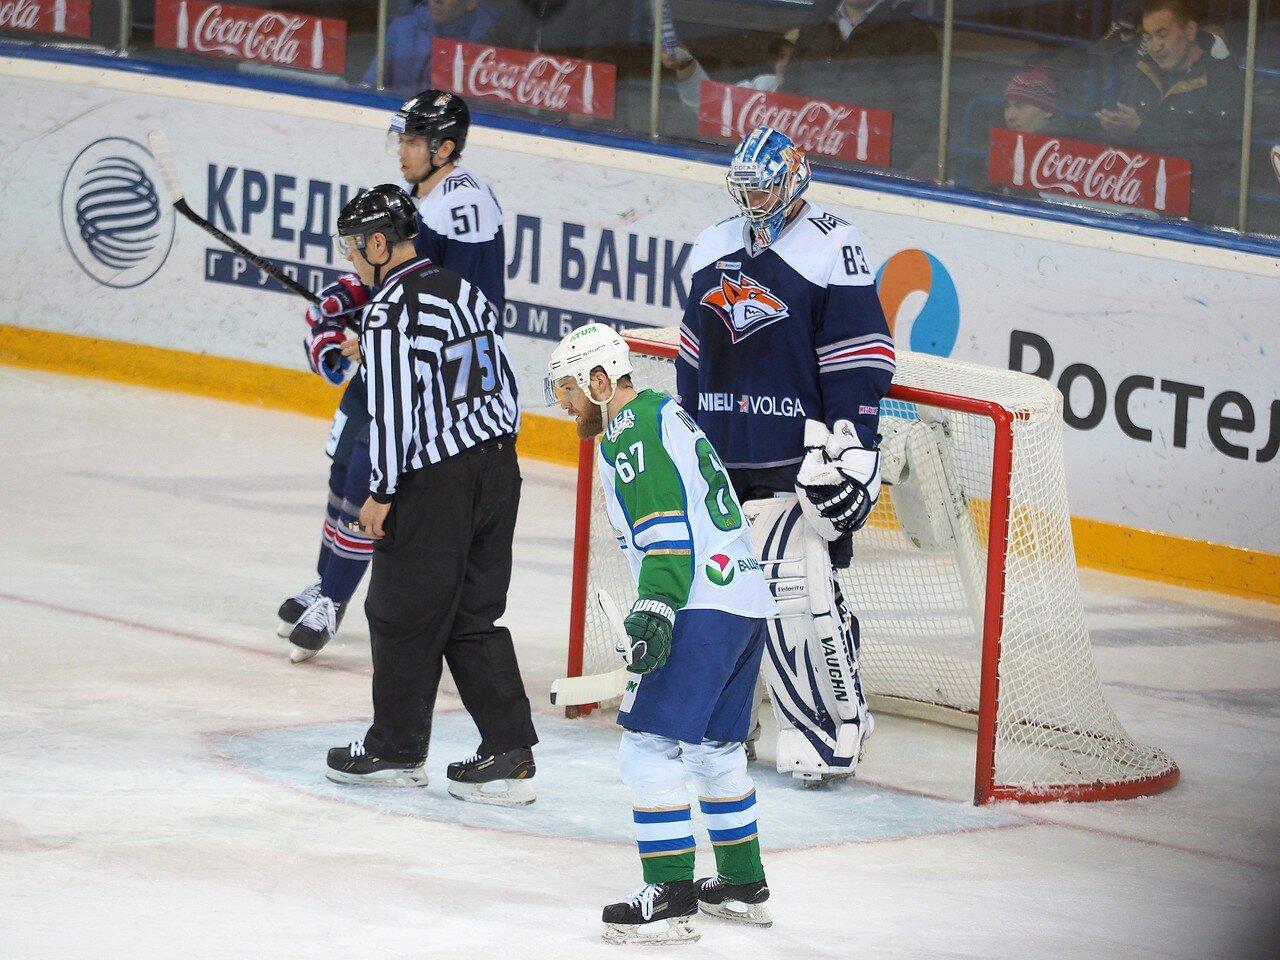 118Плей-офф 2016 Восток Финал Металлург - Салават Юлаев 23.03.2016